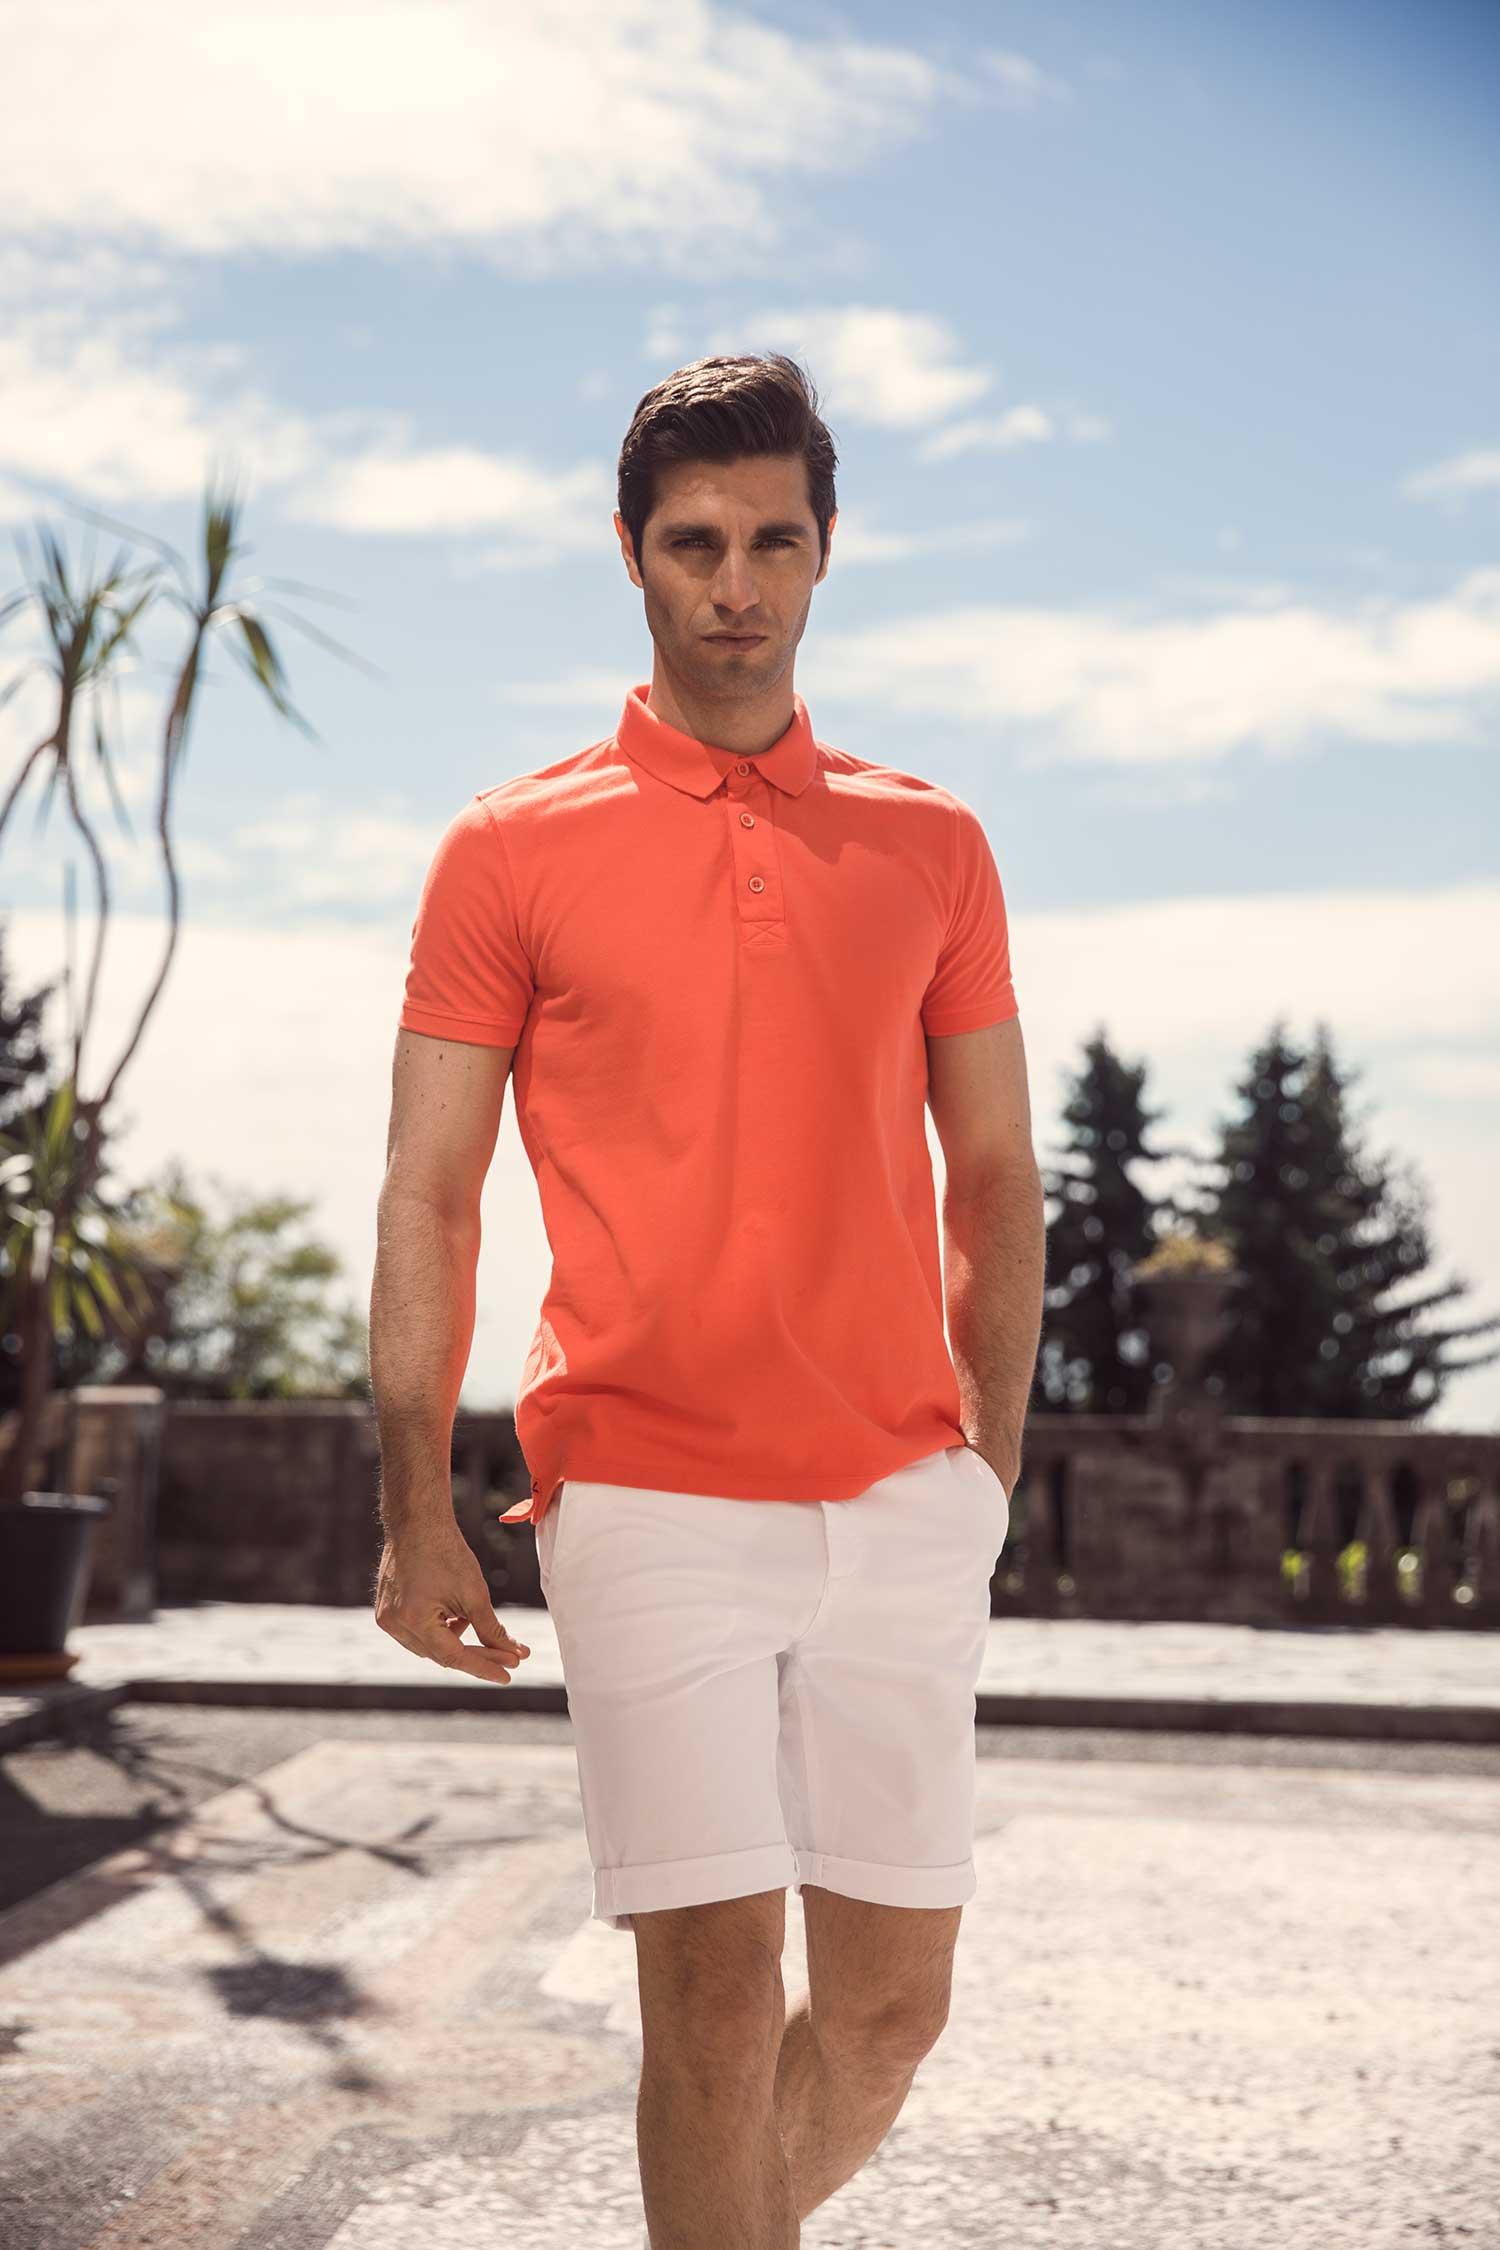 Stijlvolle zomerkleding